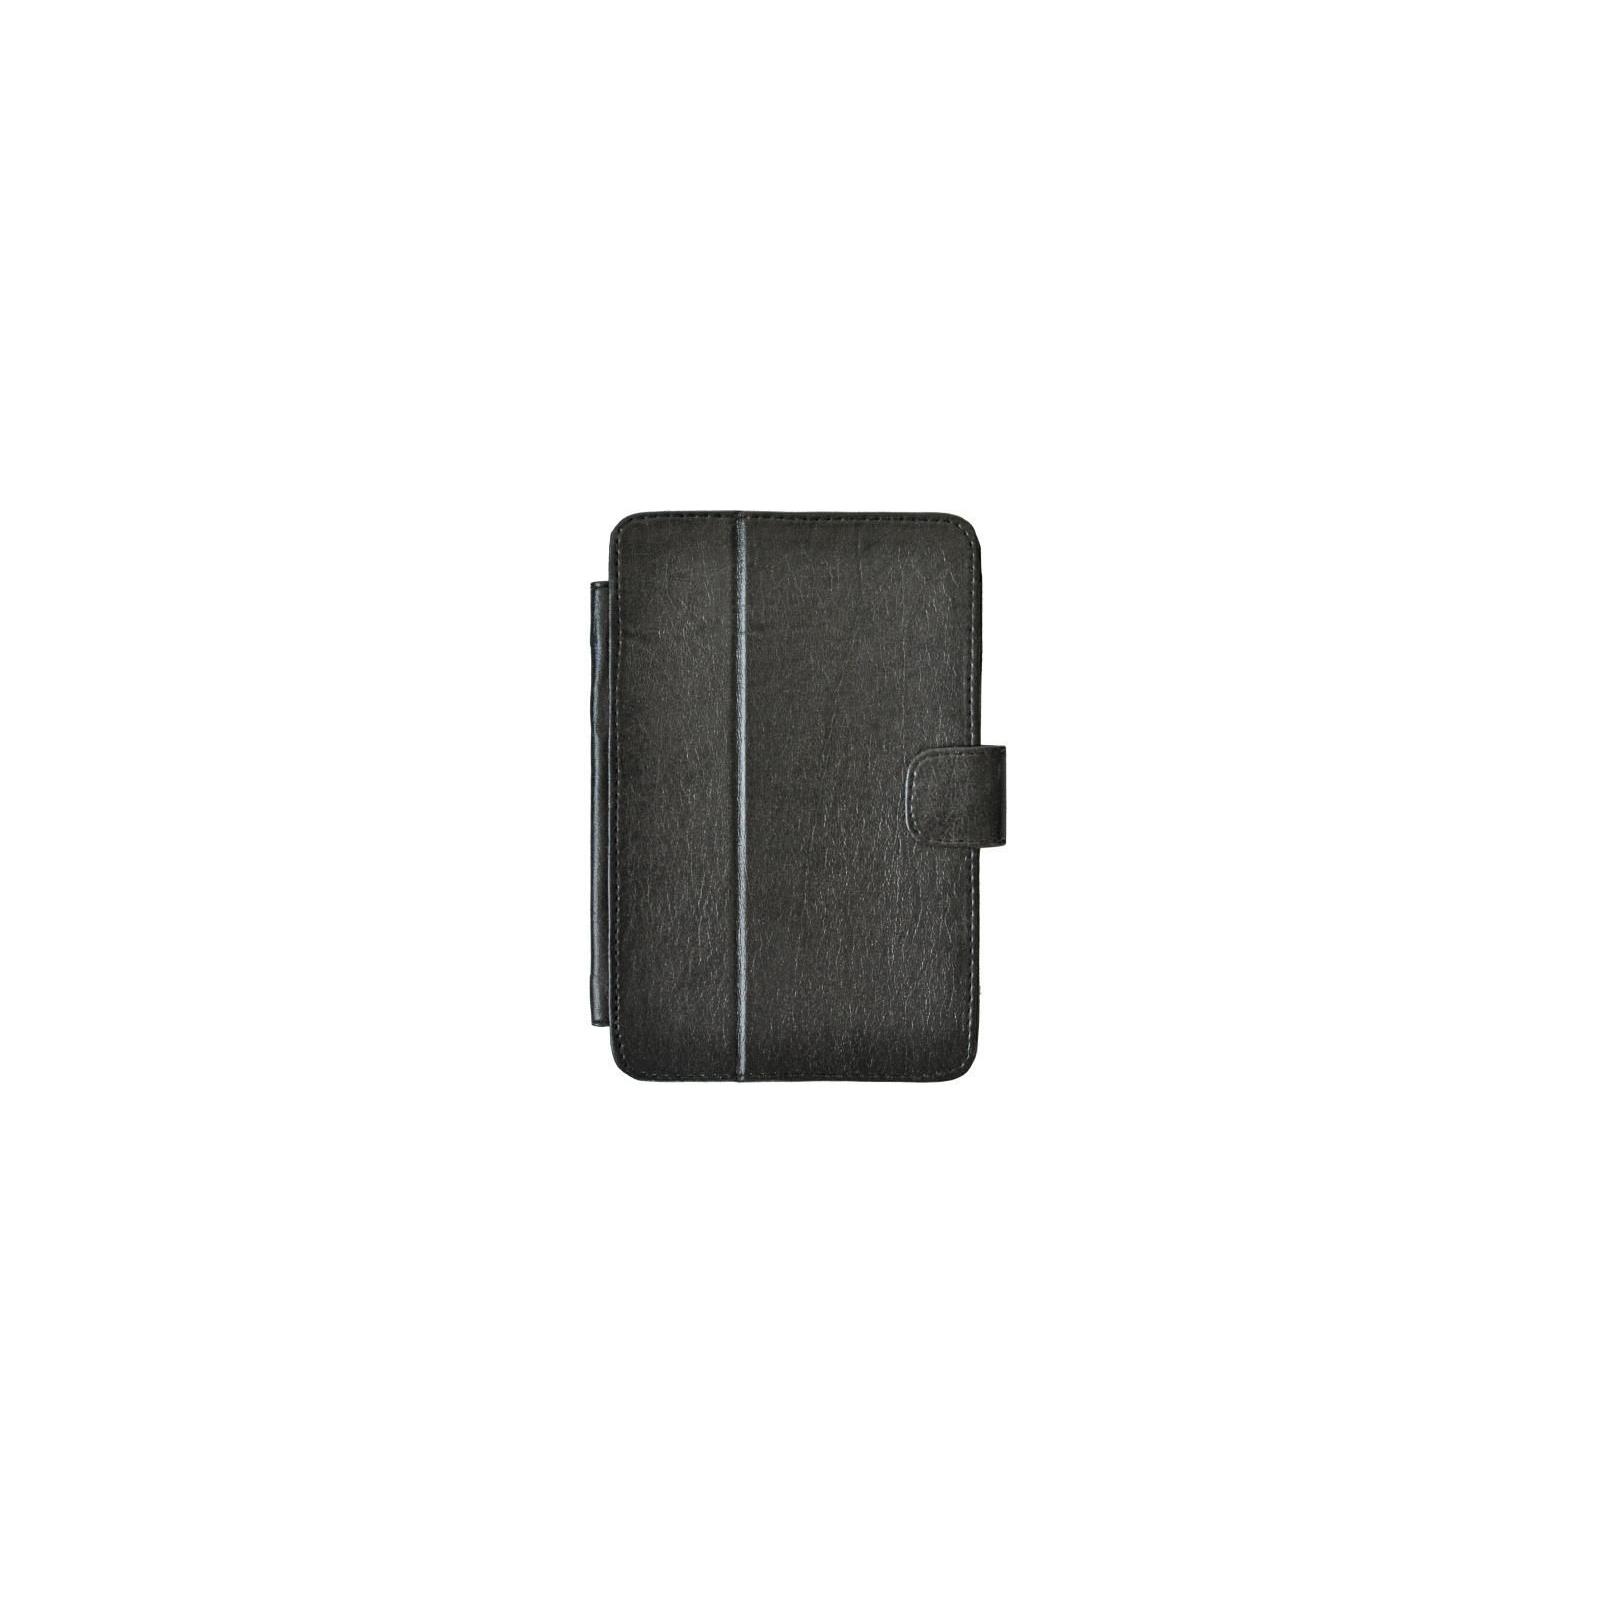 Чехол для планшета Vento 7 COOL - black